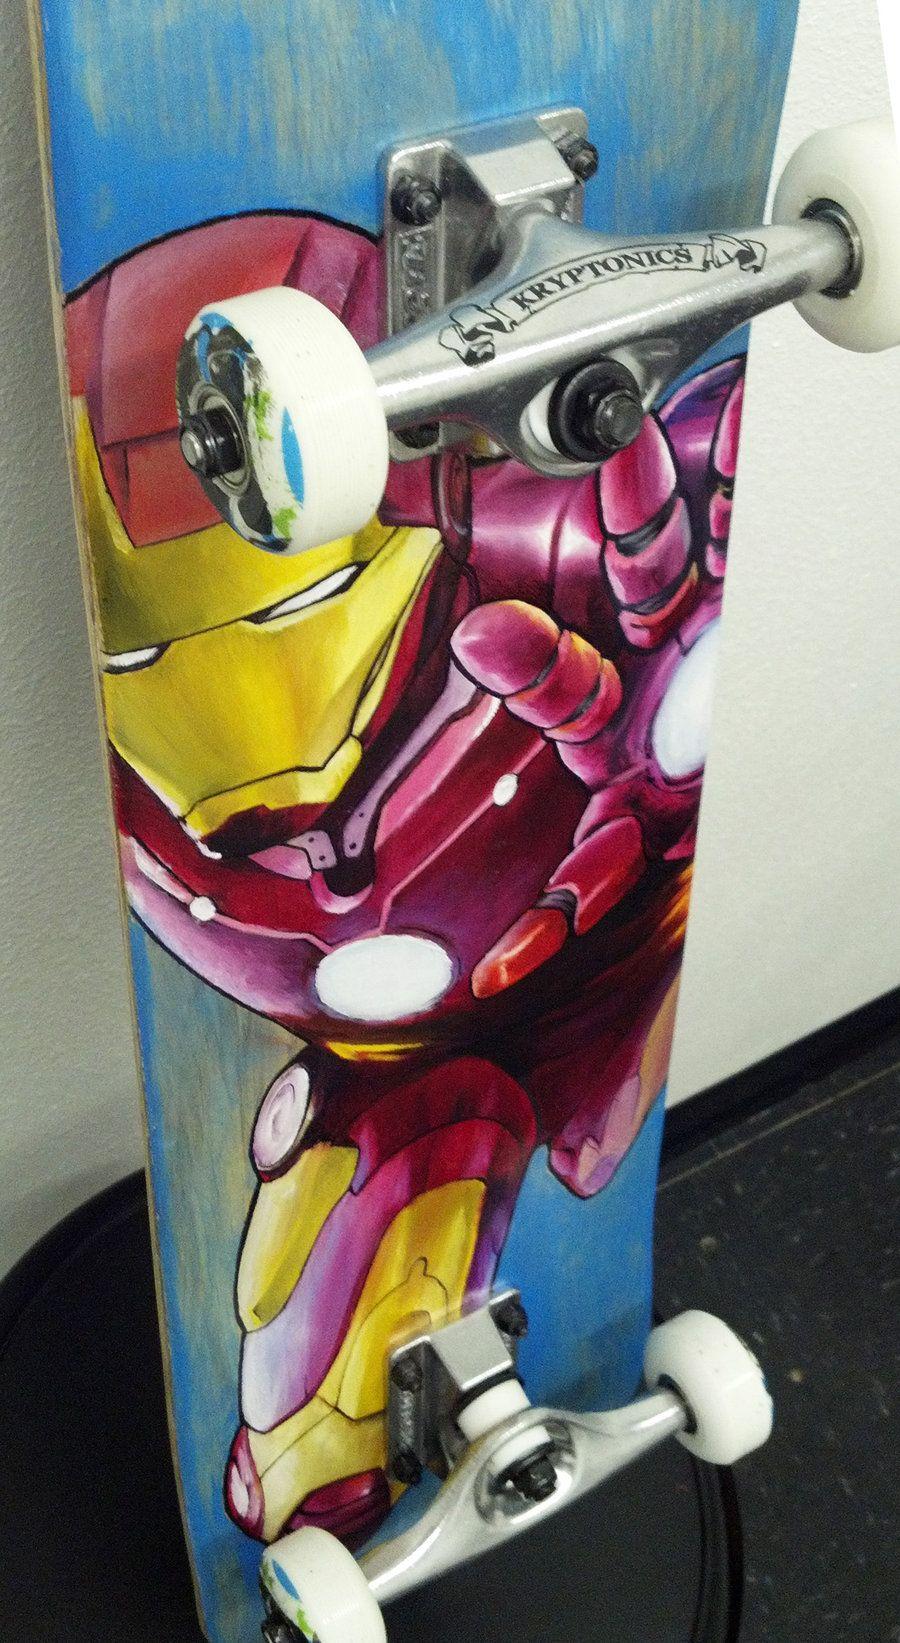 Iron Man Painting Oil Paint On Skateboard Deck Skateboard Art Iron Man Painting Trap Art